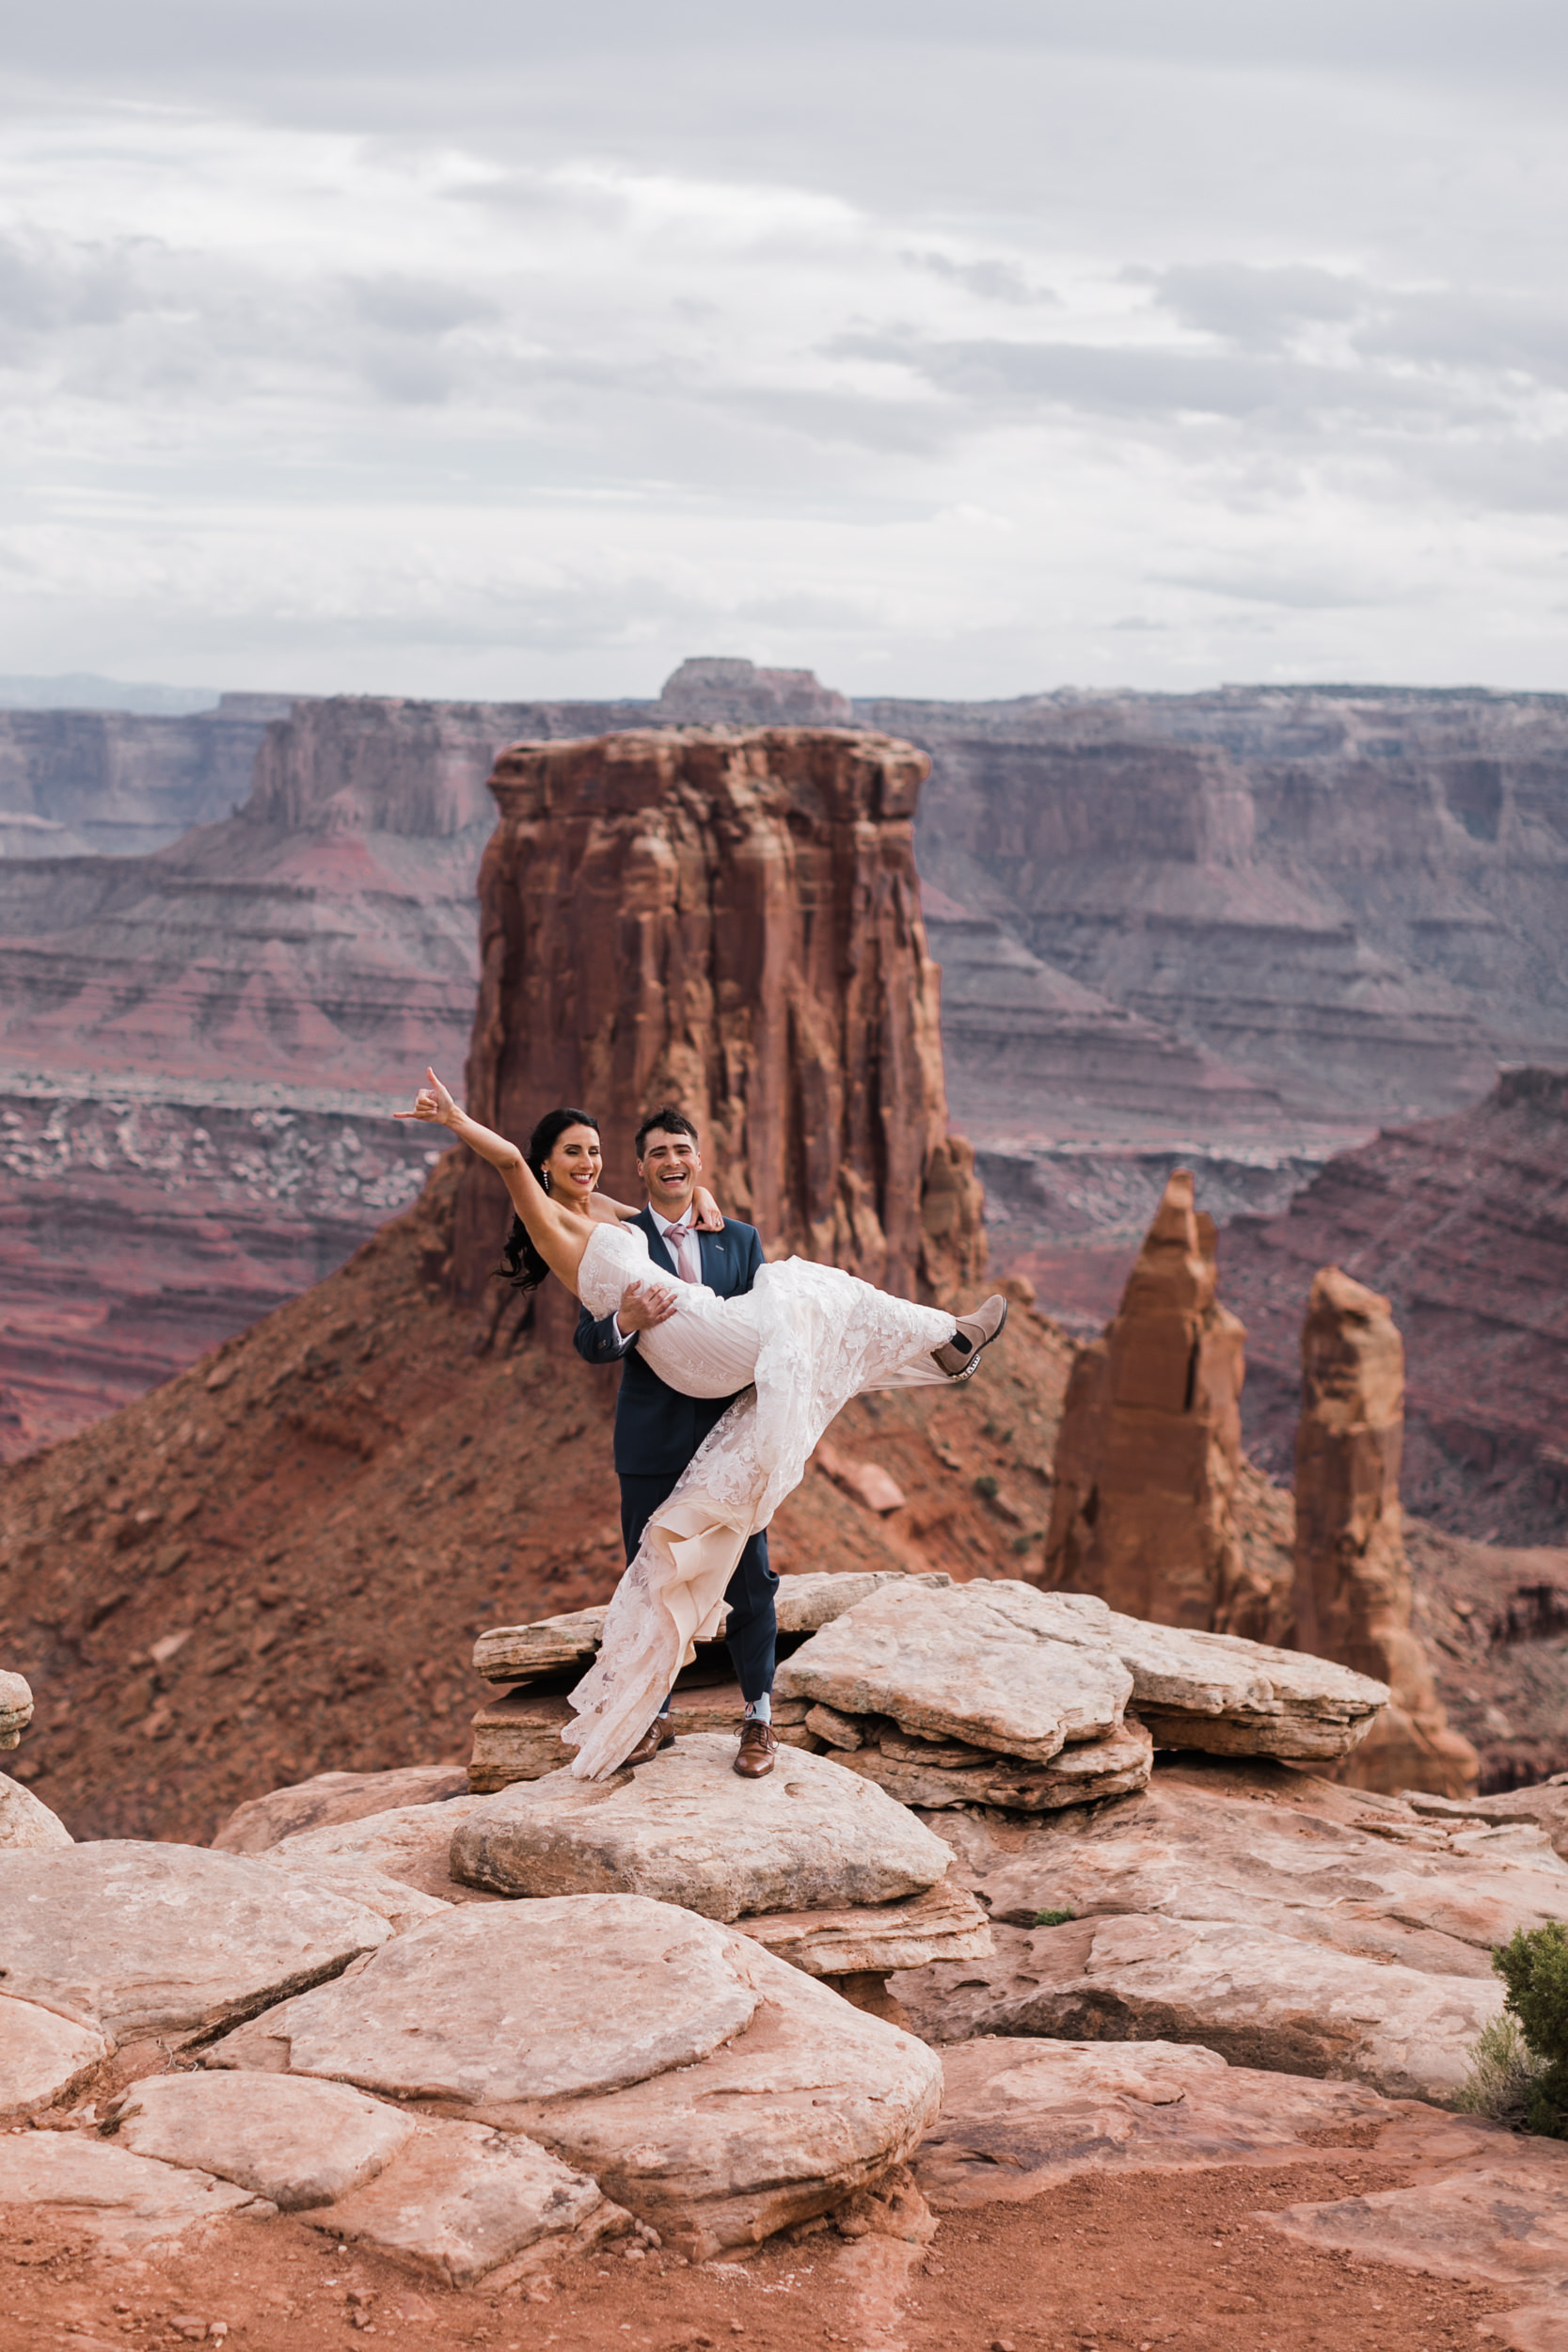 Jeep-Wedding-Moab-Utah-Hearnes-Adventure-Elopement-Photography-29.jpg